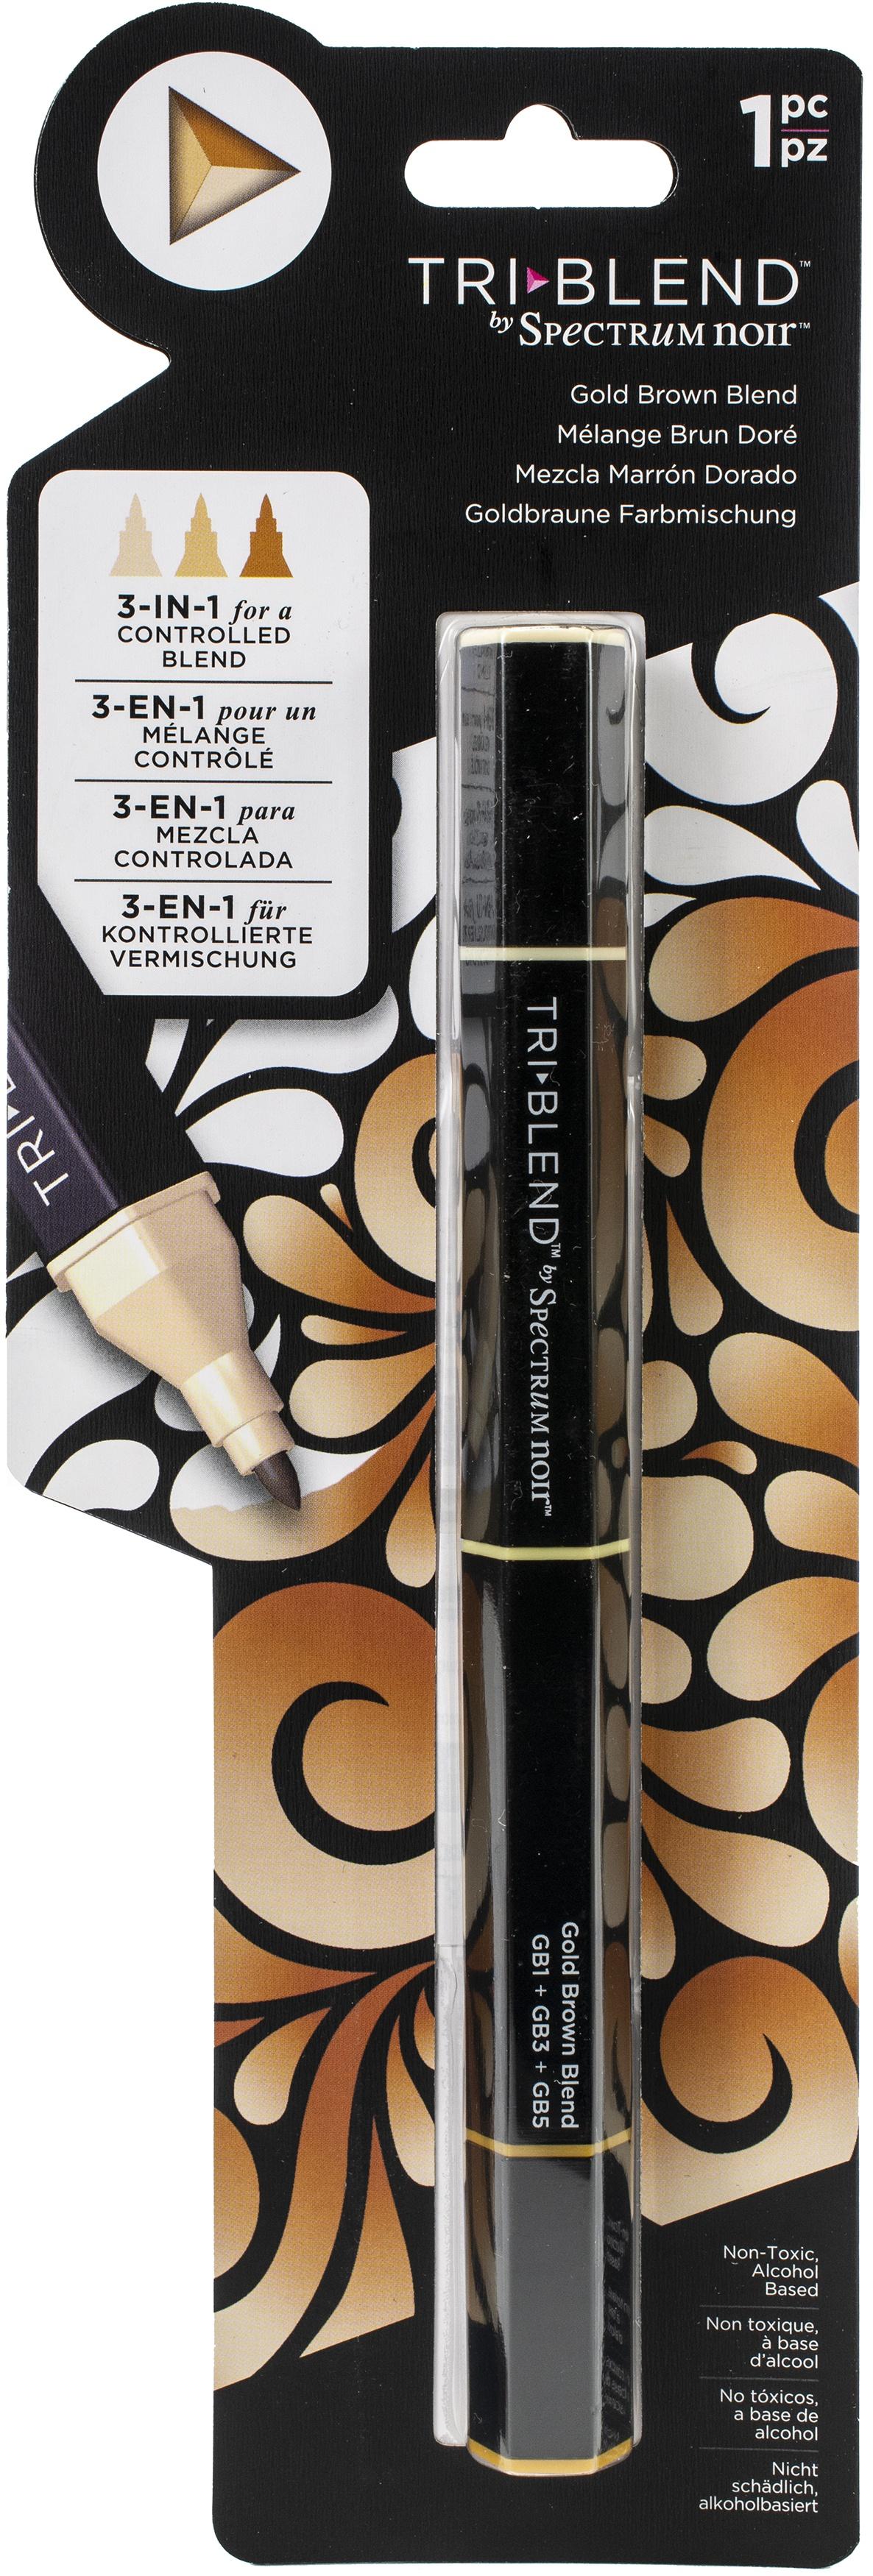 Spectrum Noir Triblend Marker-Gold Brown Blend